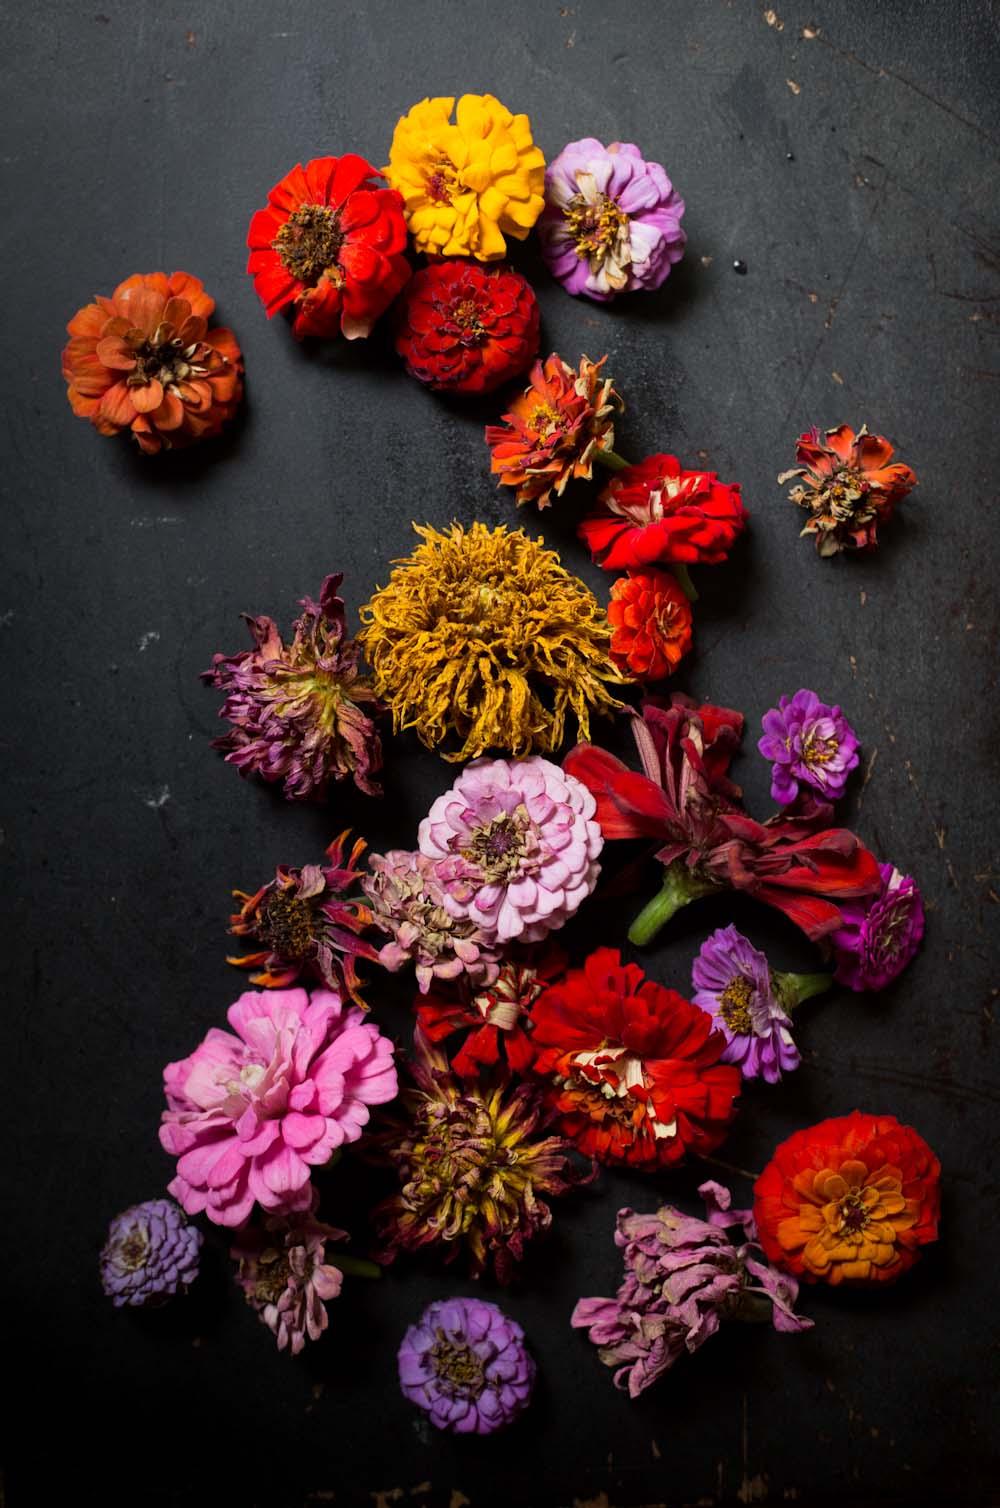 zinnia flowerheads-0422.jpg